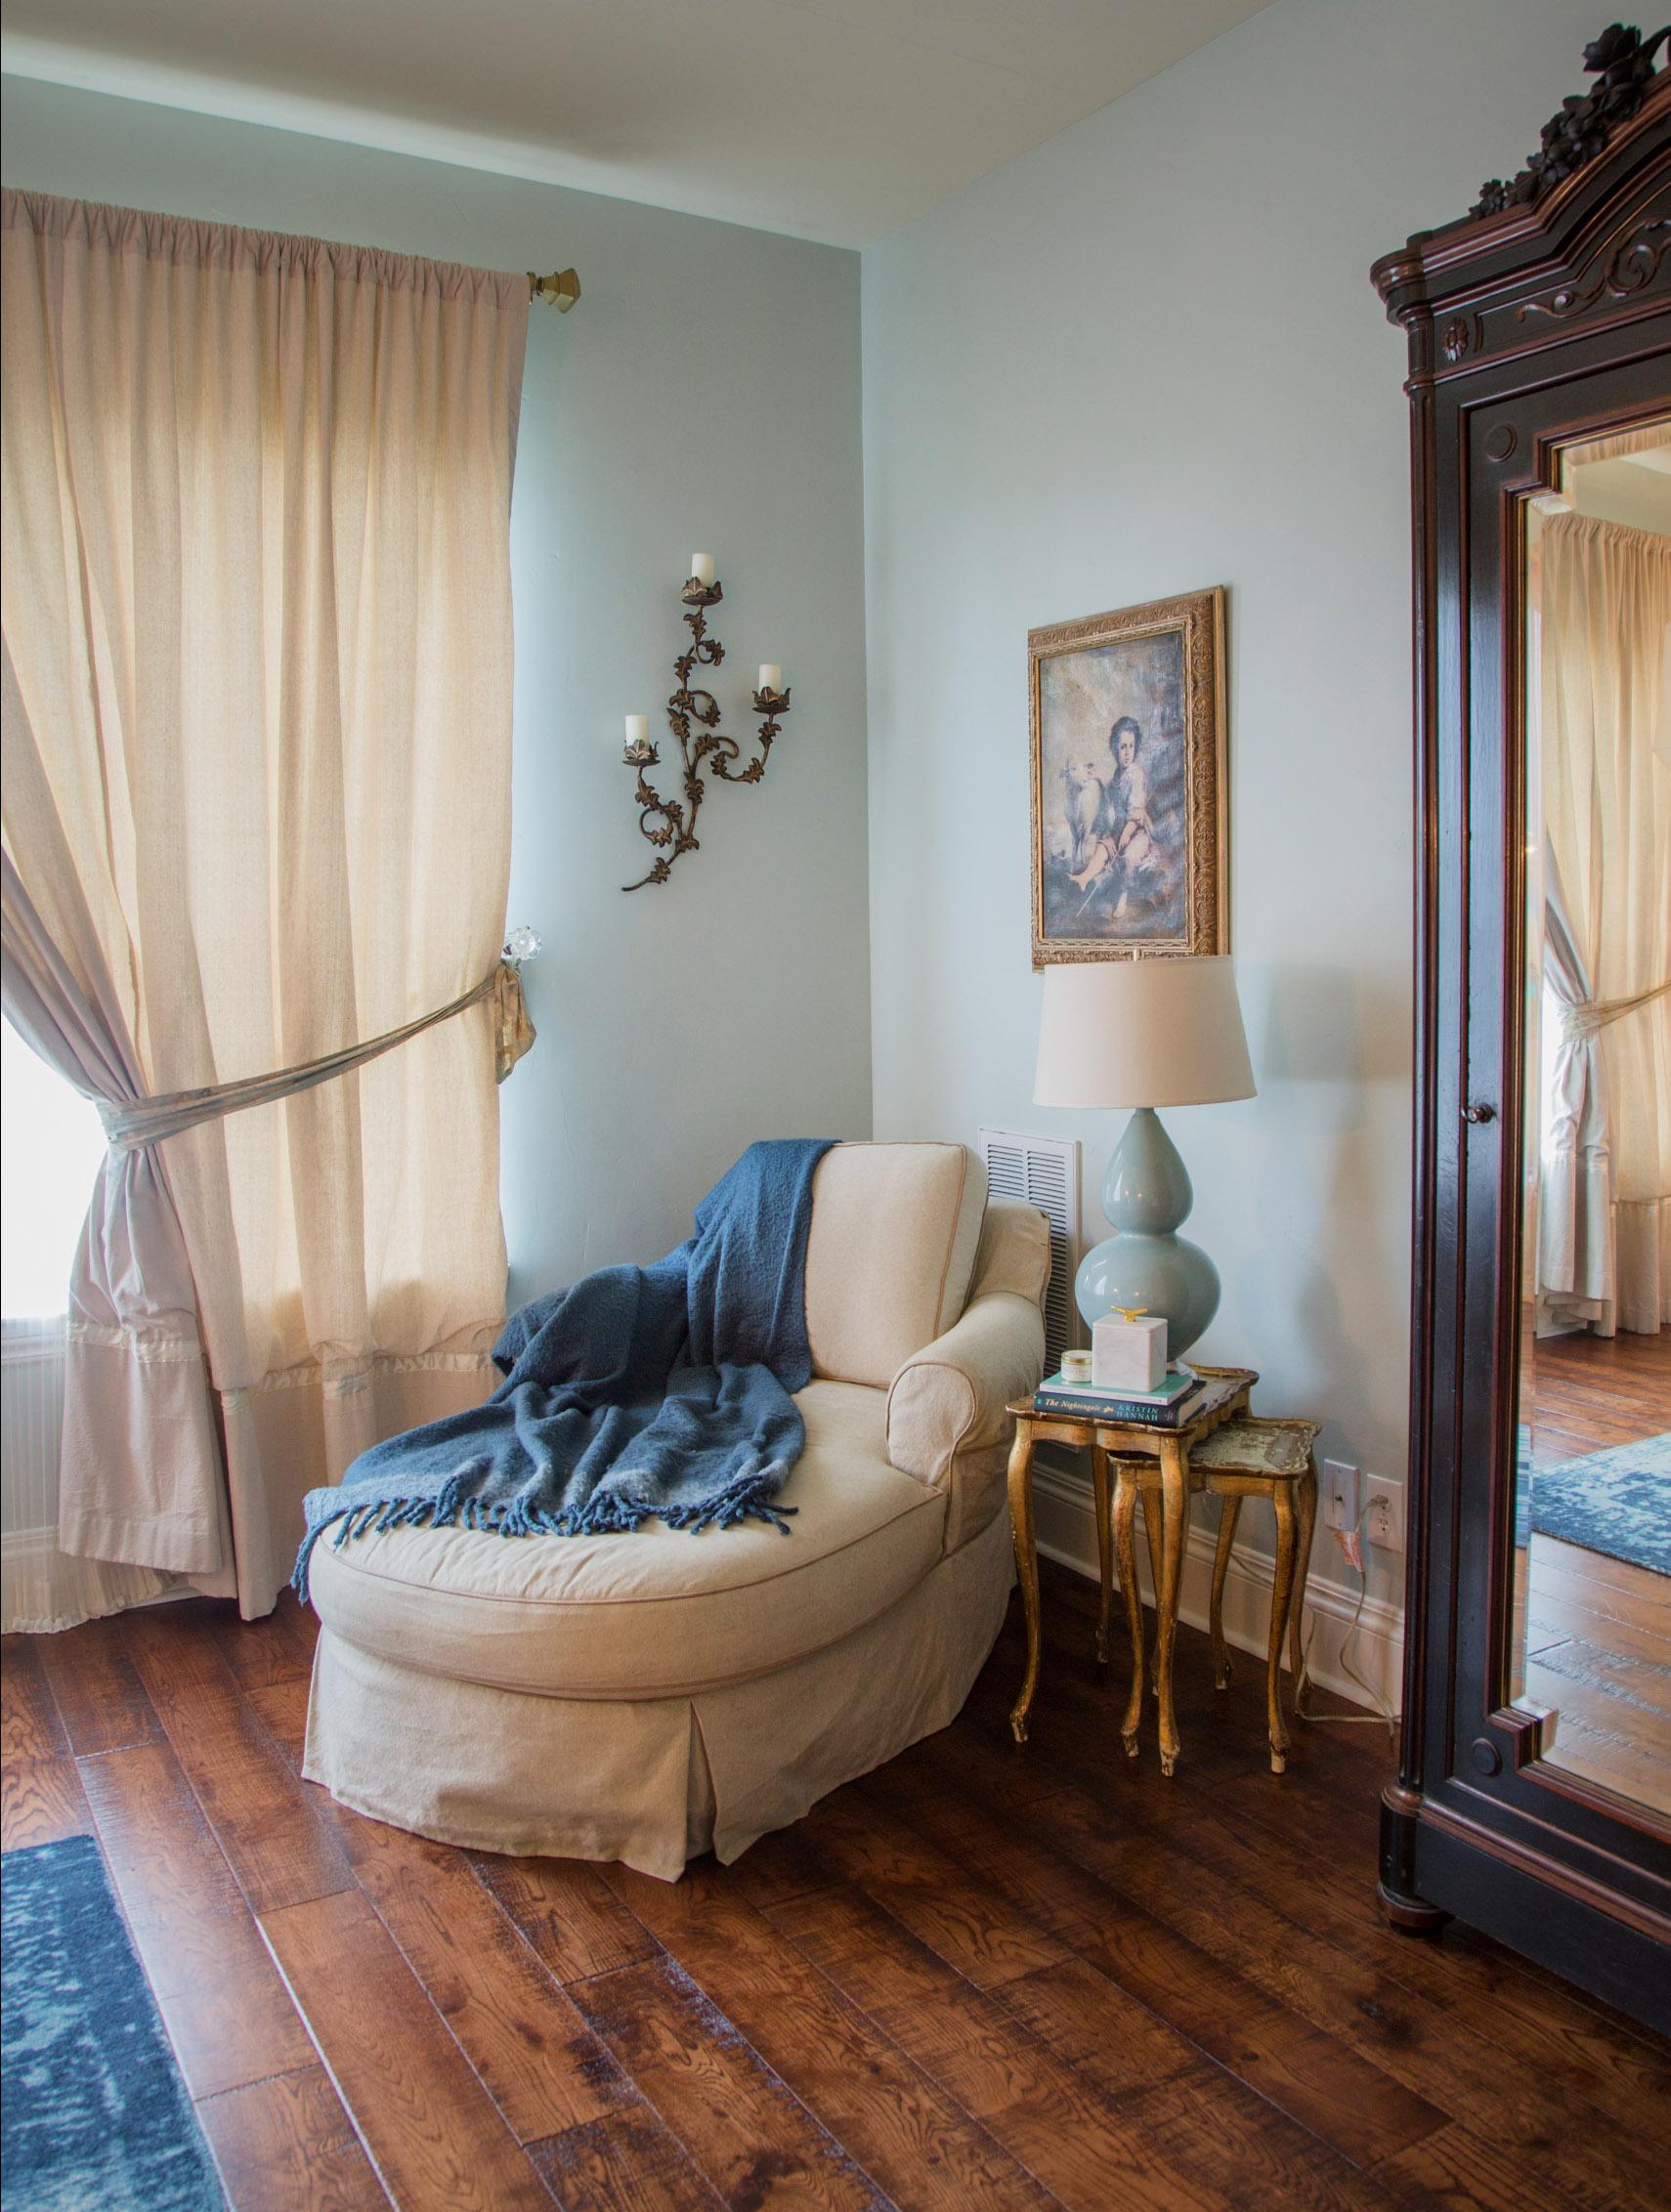 Chaise Lounge - Abode Interior Design